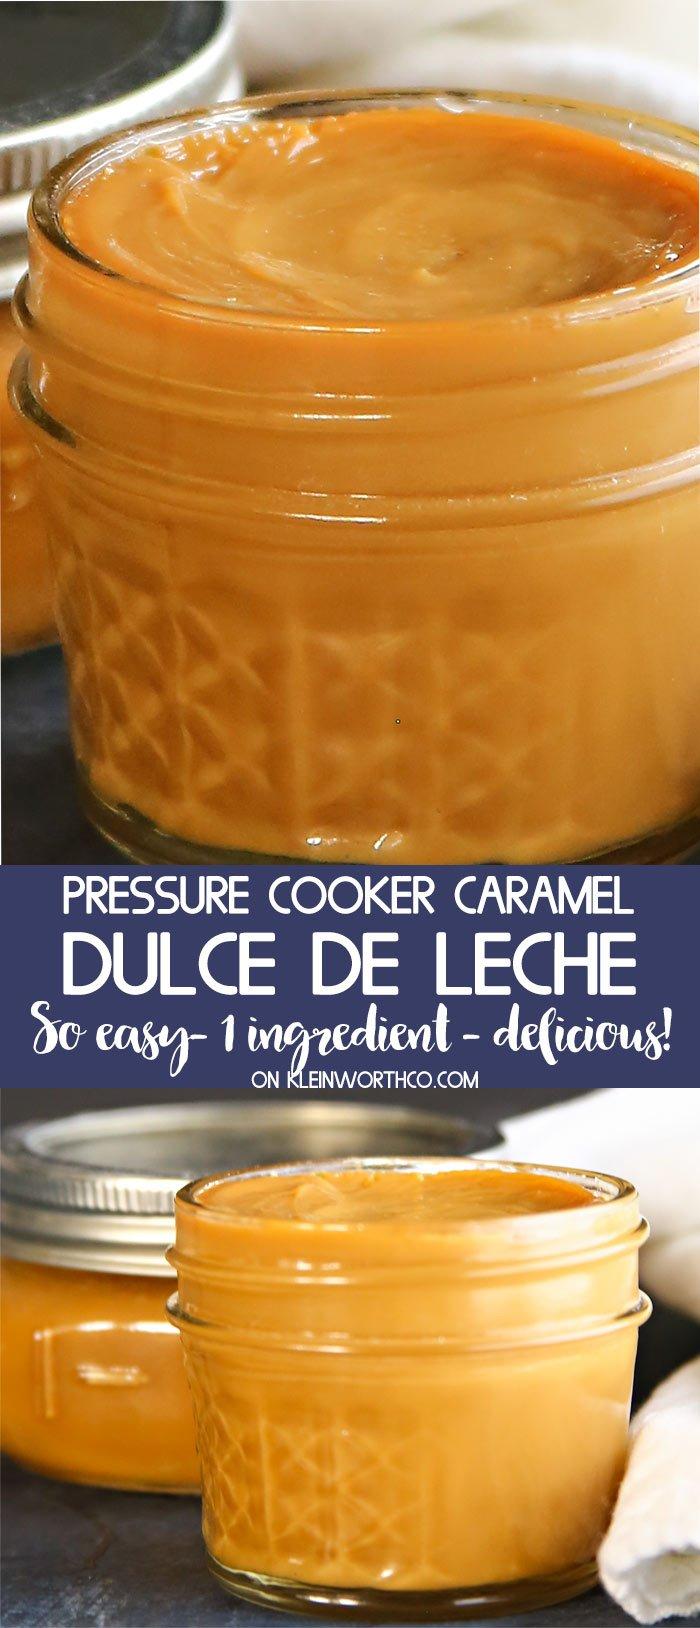 Pressure Cooker Caramel Dulce de Leche